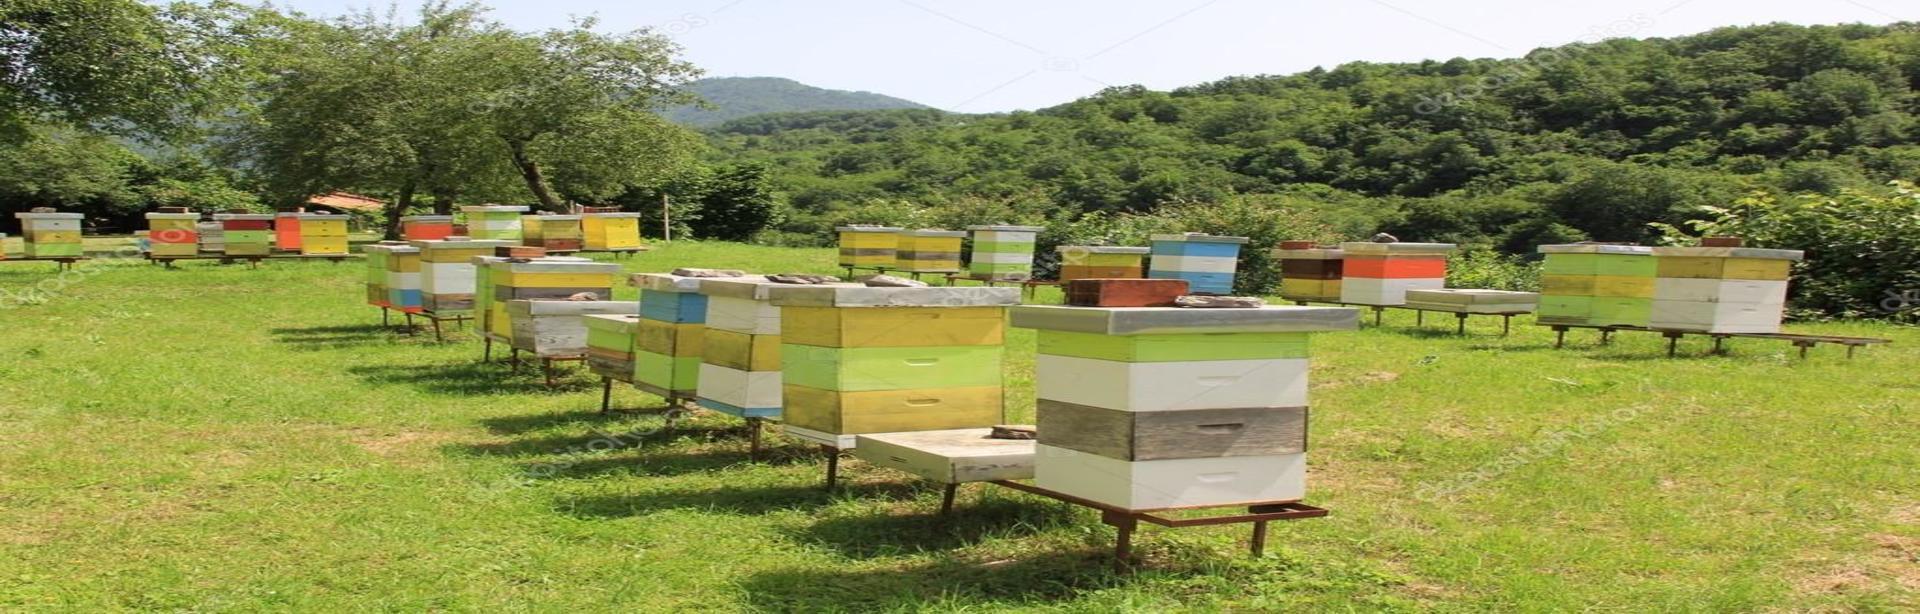 Formation en apiculture